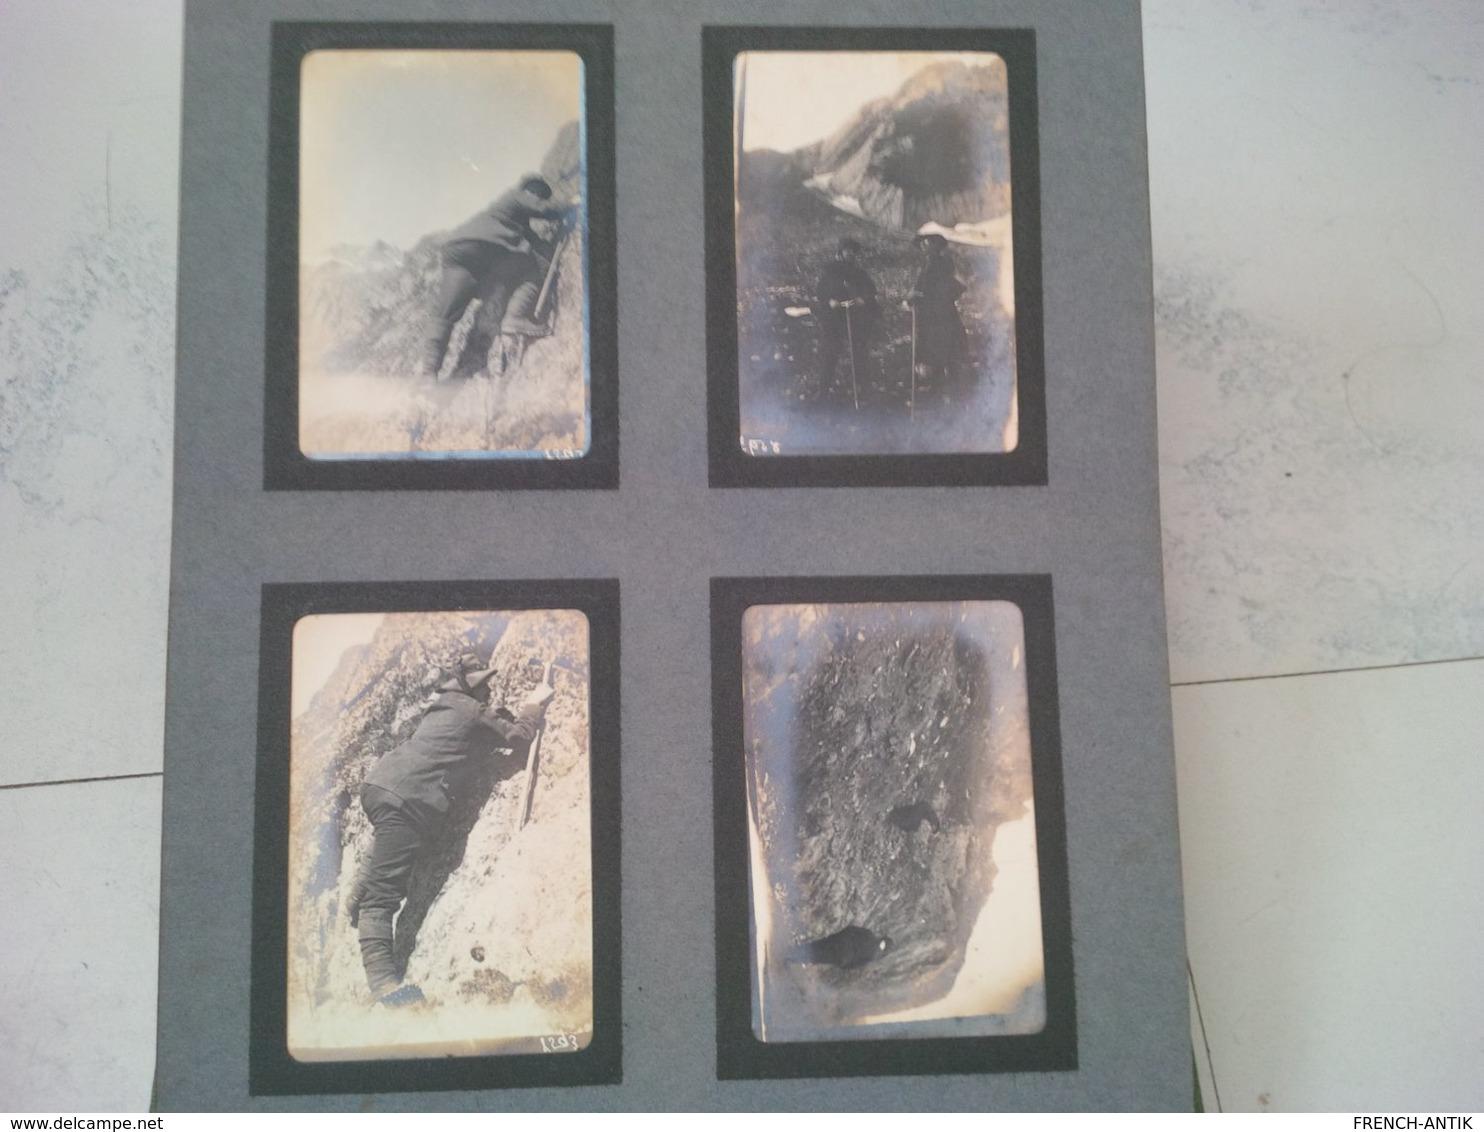 LOT 4 ALBUM SPORTS D HIVER MONTAGNE ZERMATT GRUNDENWALD BERNE MONT ST BERNARD BERN OURS CHIEN SKI - Albumes & Colecciones